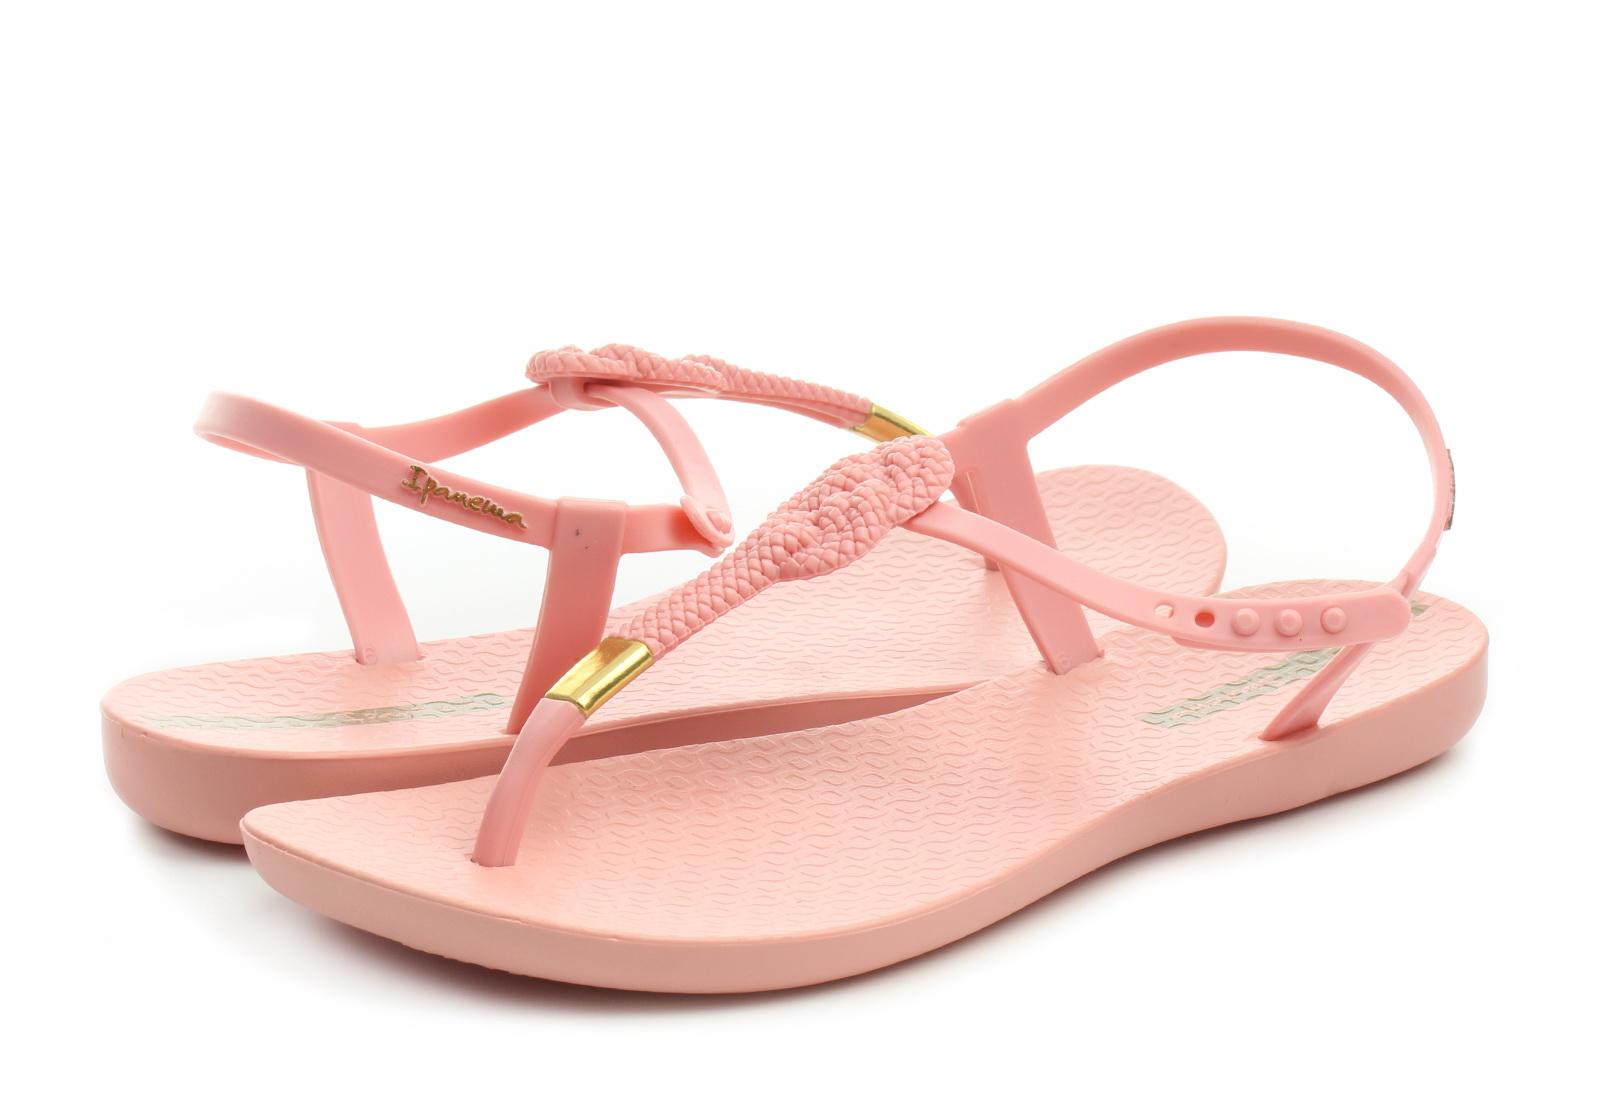 Ipanema Sandale Classic Glam Ii Sandal